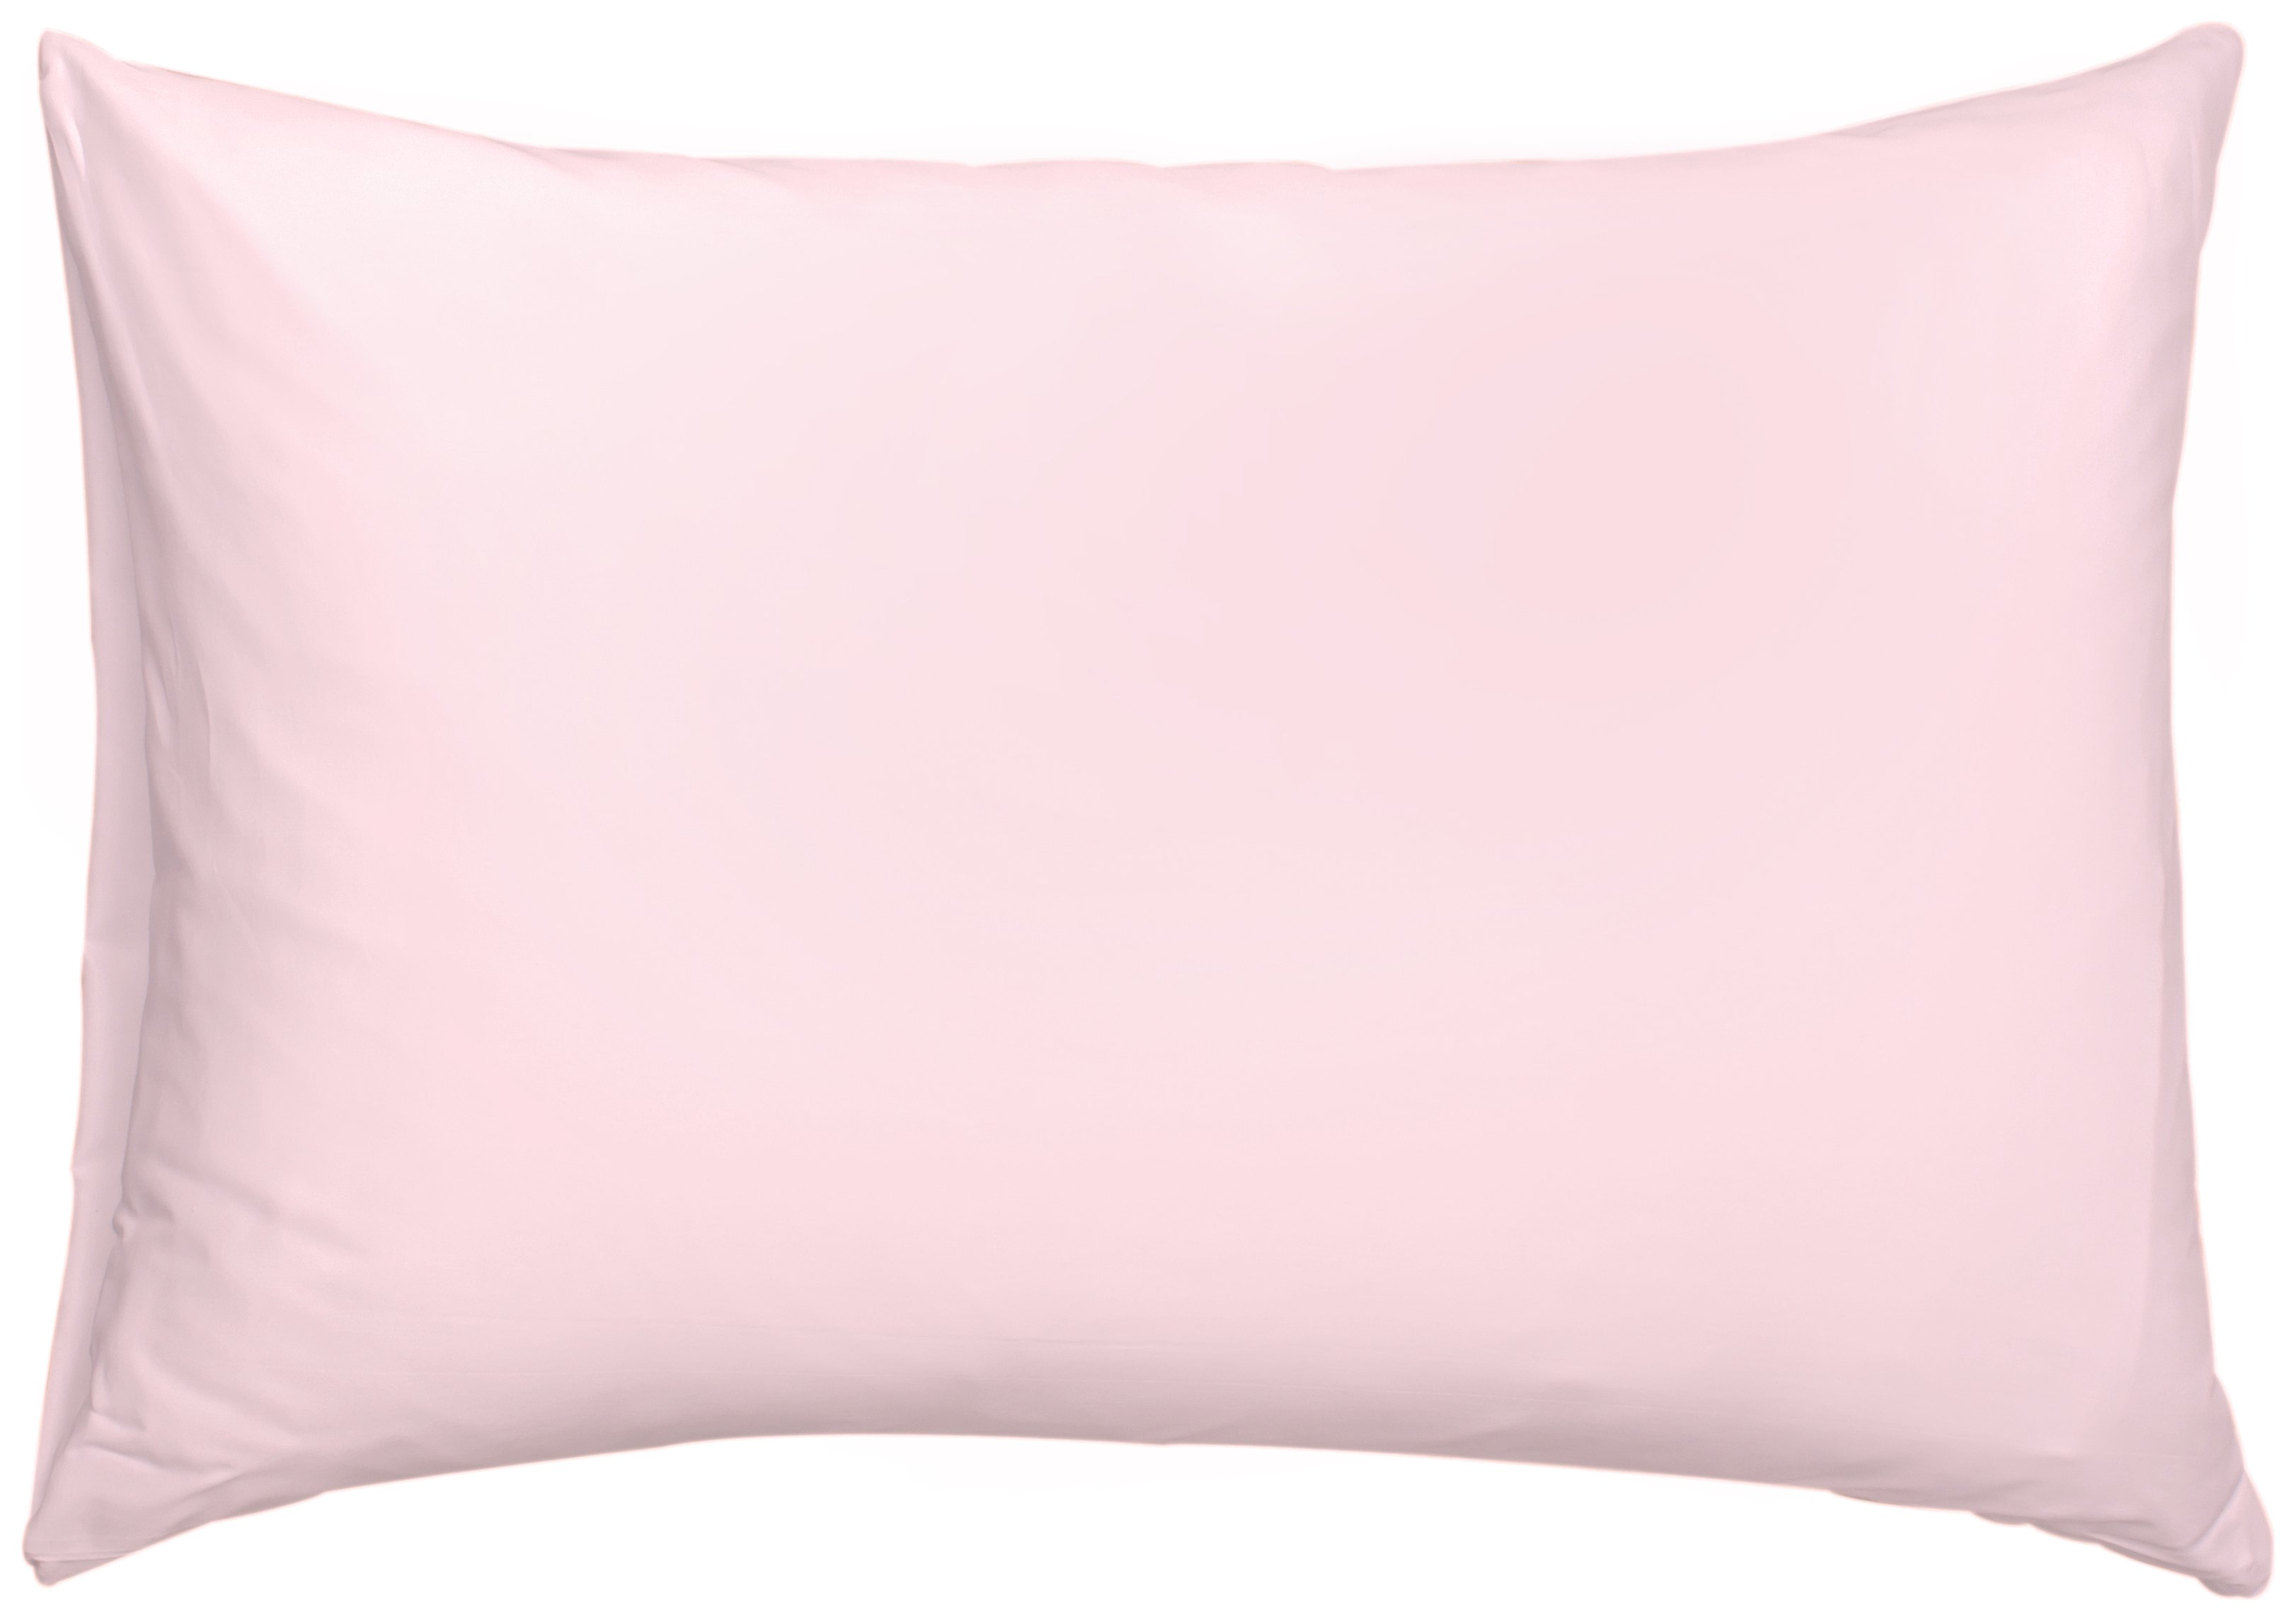 downland  kingsize pink pillowcases  set of 2